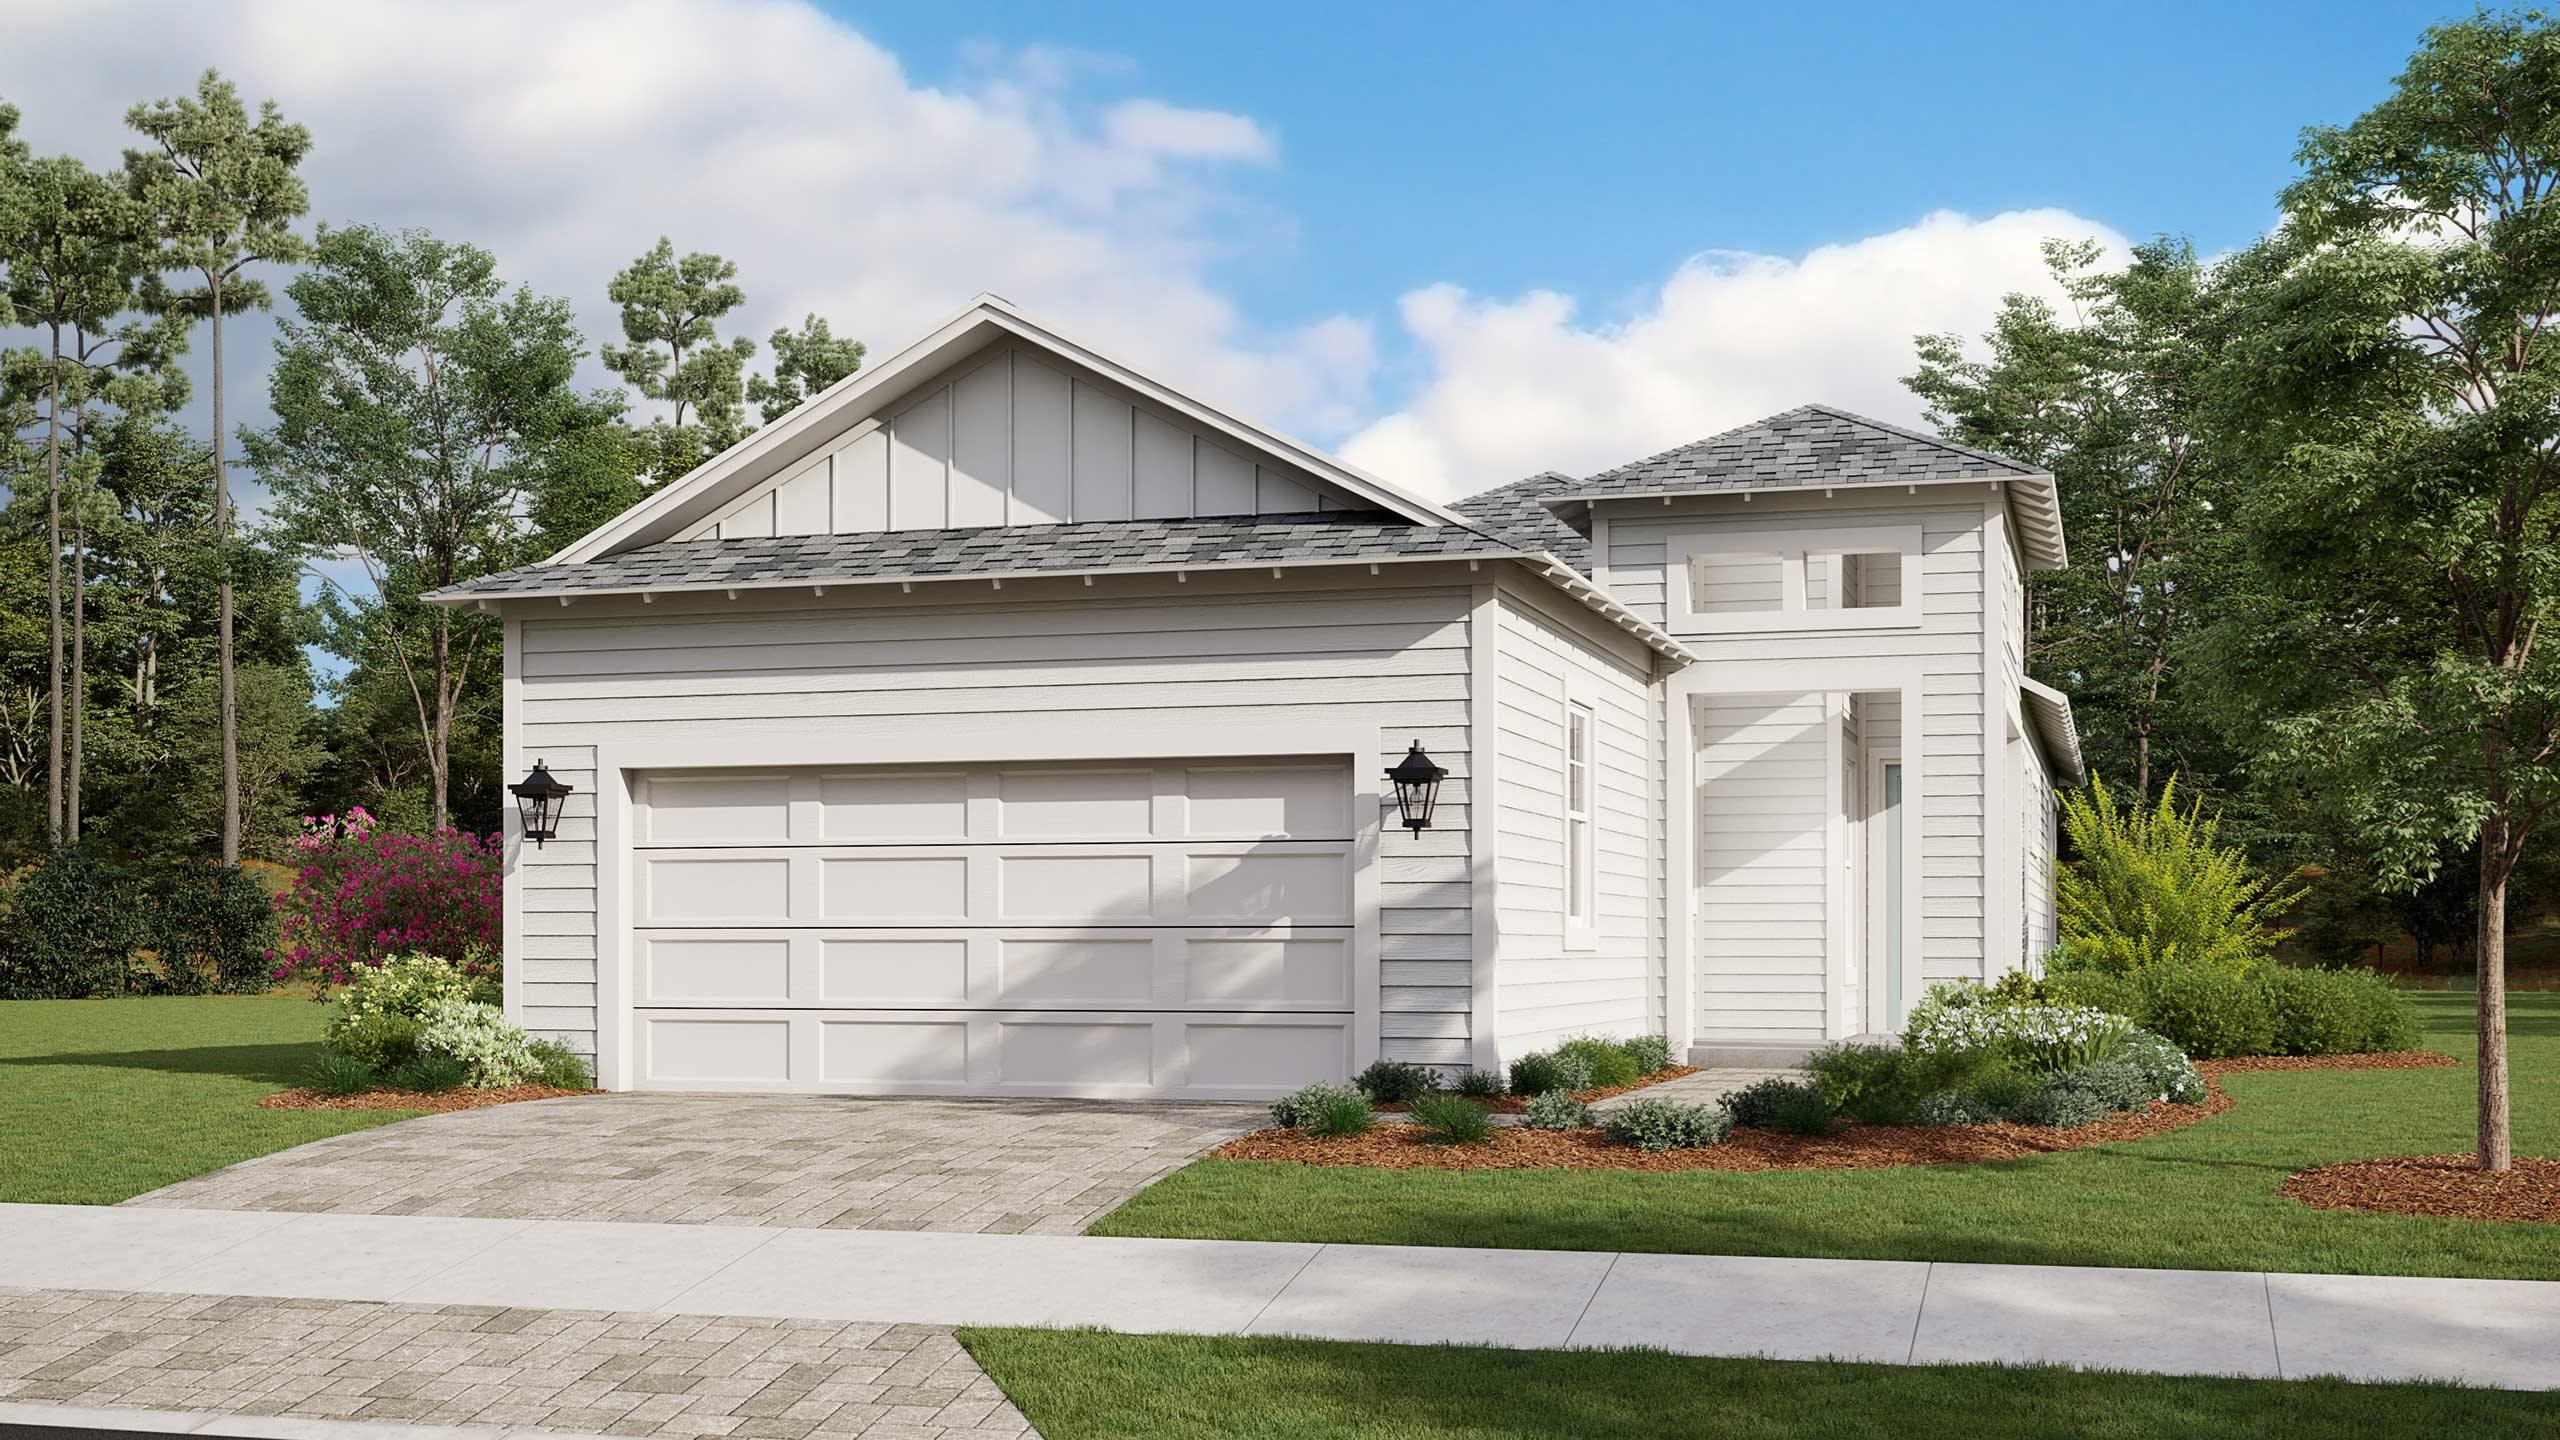 Captiva Main Exterior in new home community SweetBay